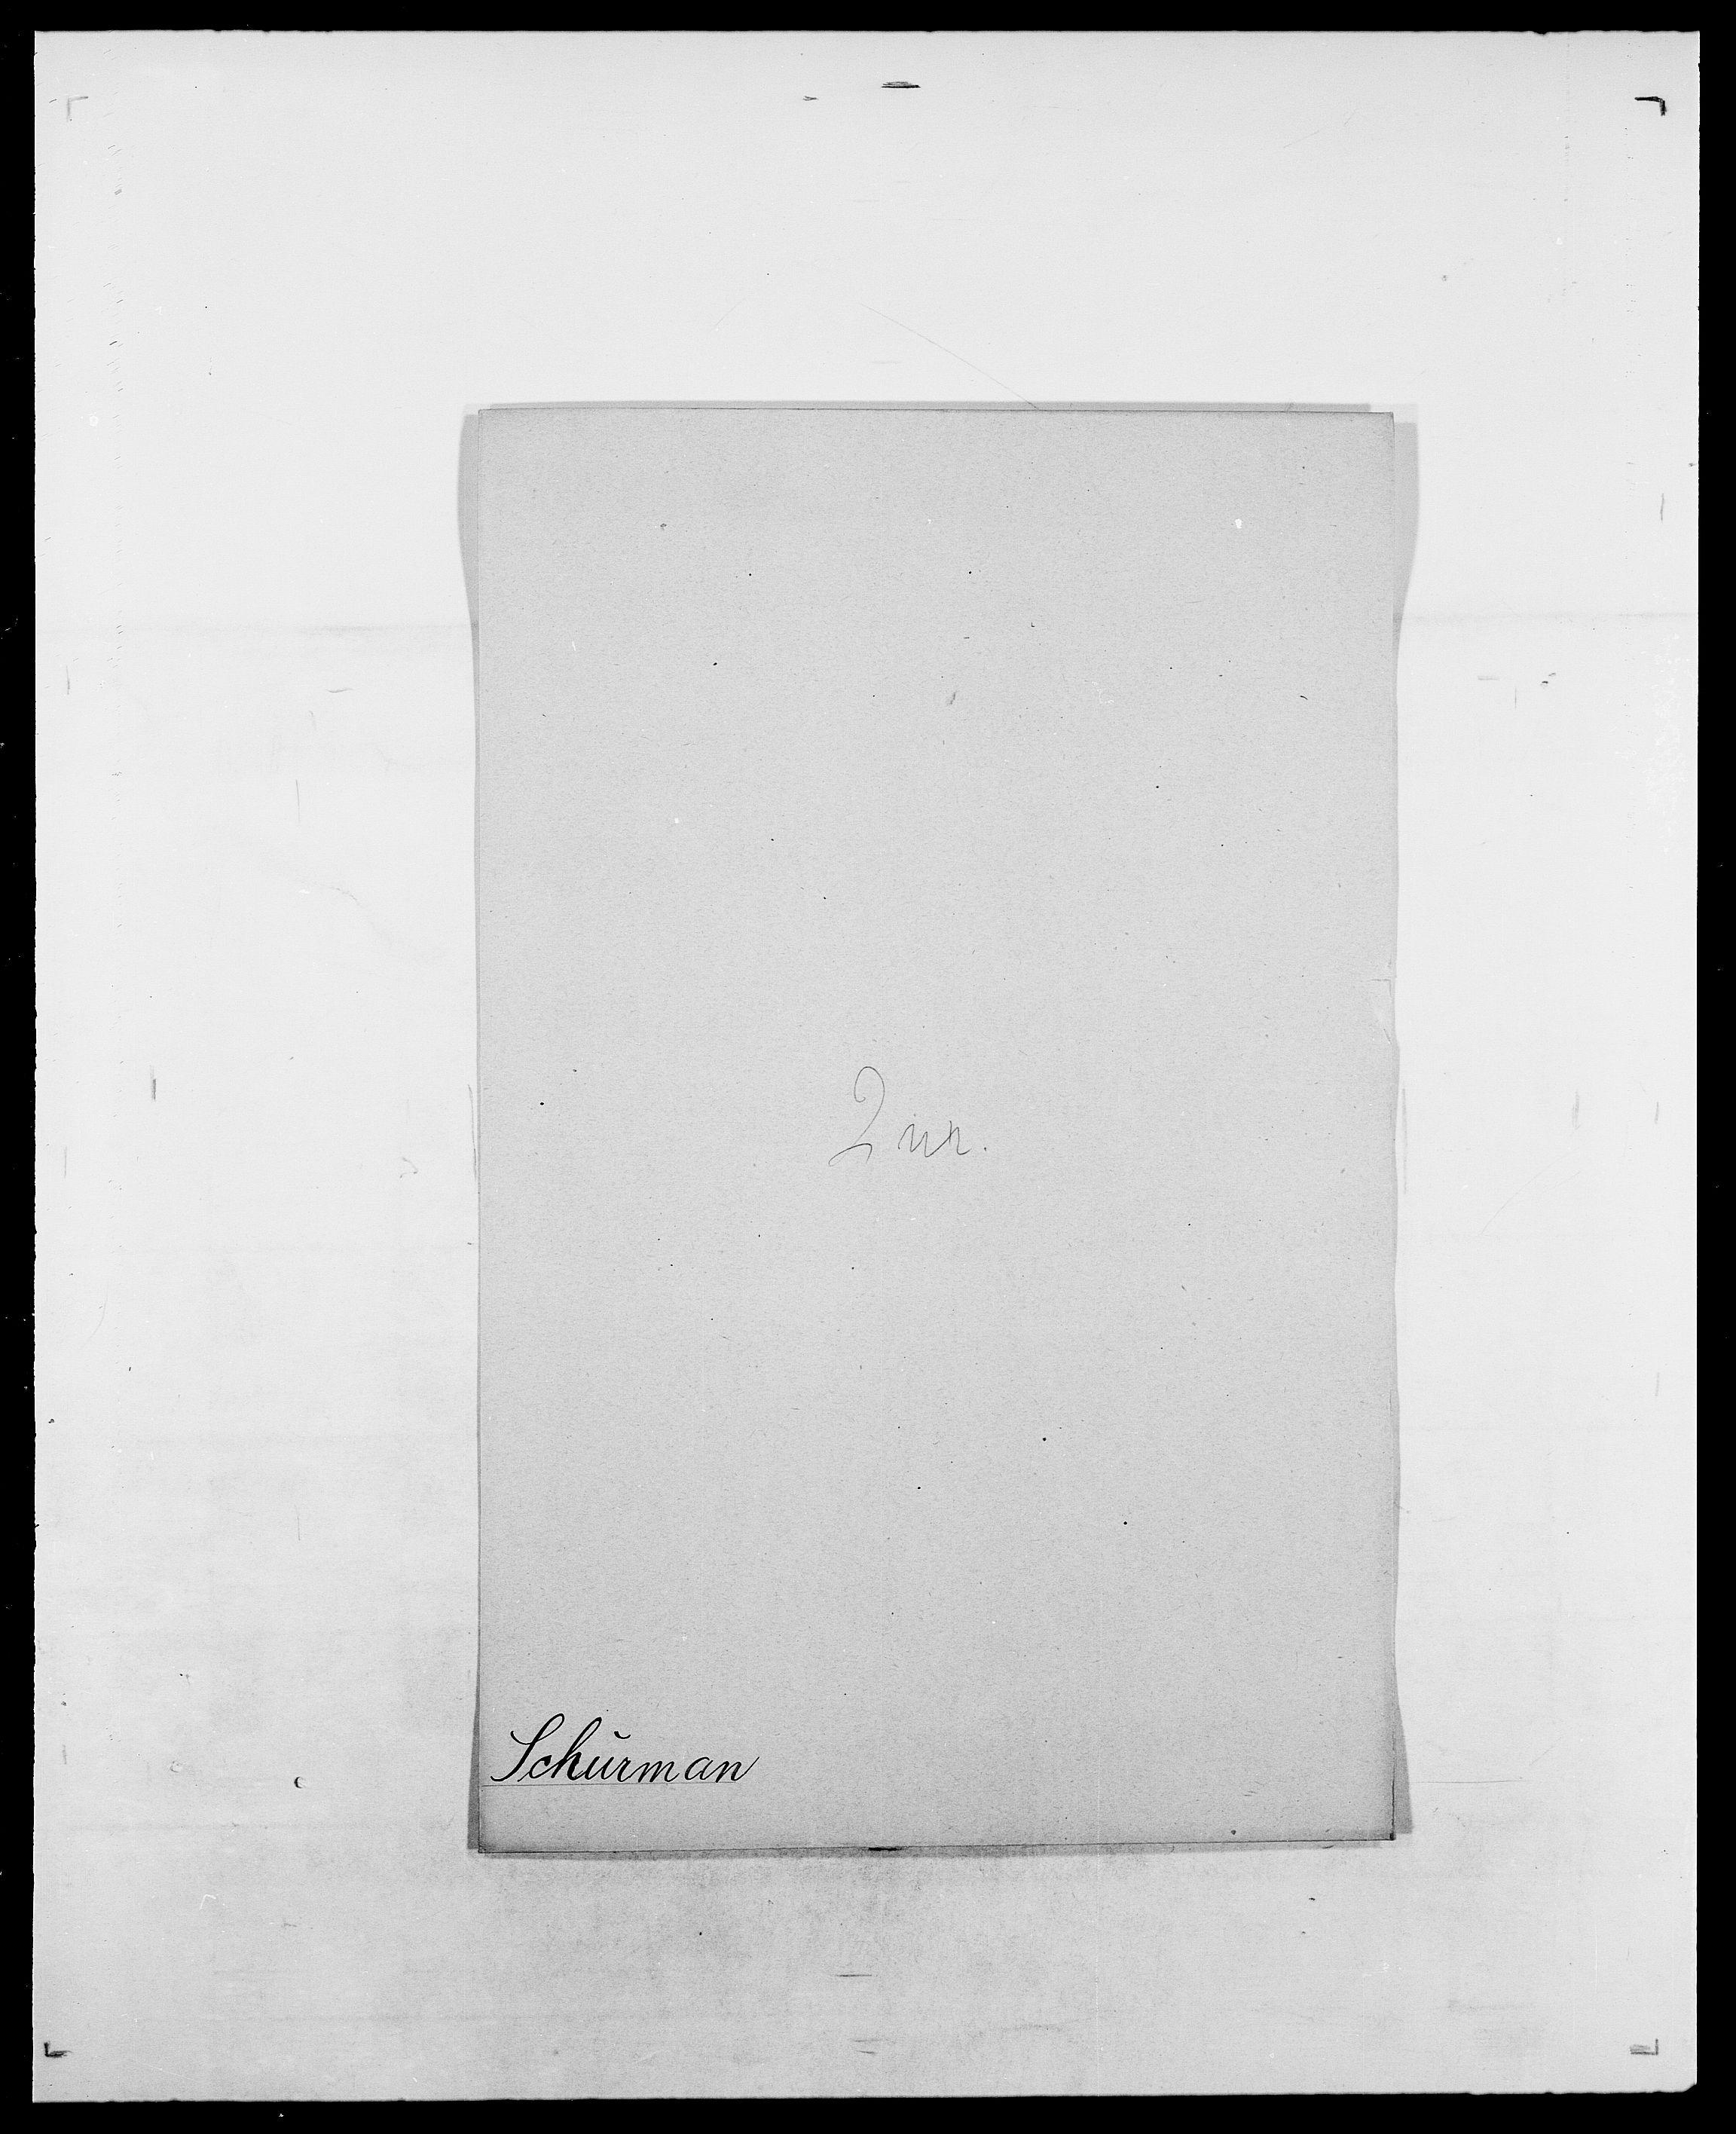 SAO, Delgobe, Charles Antoine - samling, D/Da/L0035: Schnabel - sjetman, s. 359